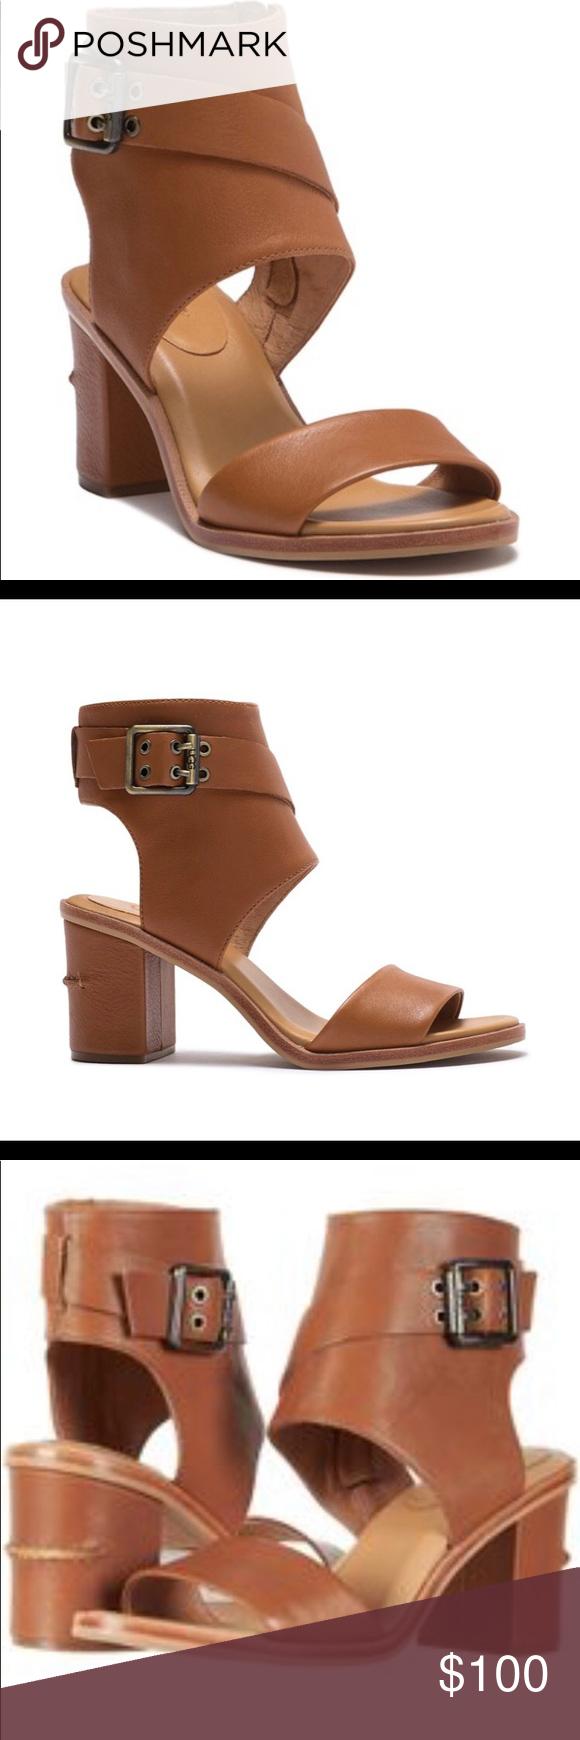 814ac29f09879 UGG Claudette Cuff Tan Almond Tan Sandal Size 7 Ugg Claudette Tan (Almond)  Sandal